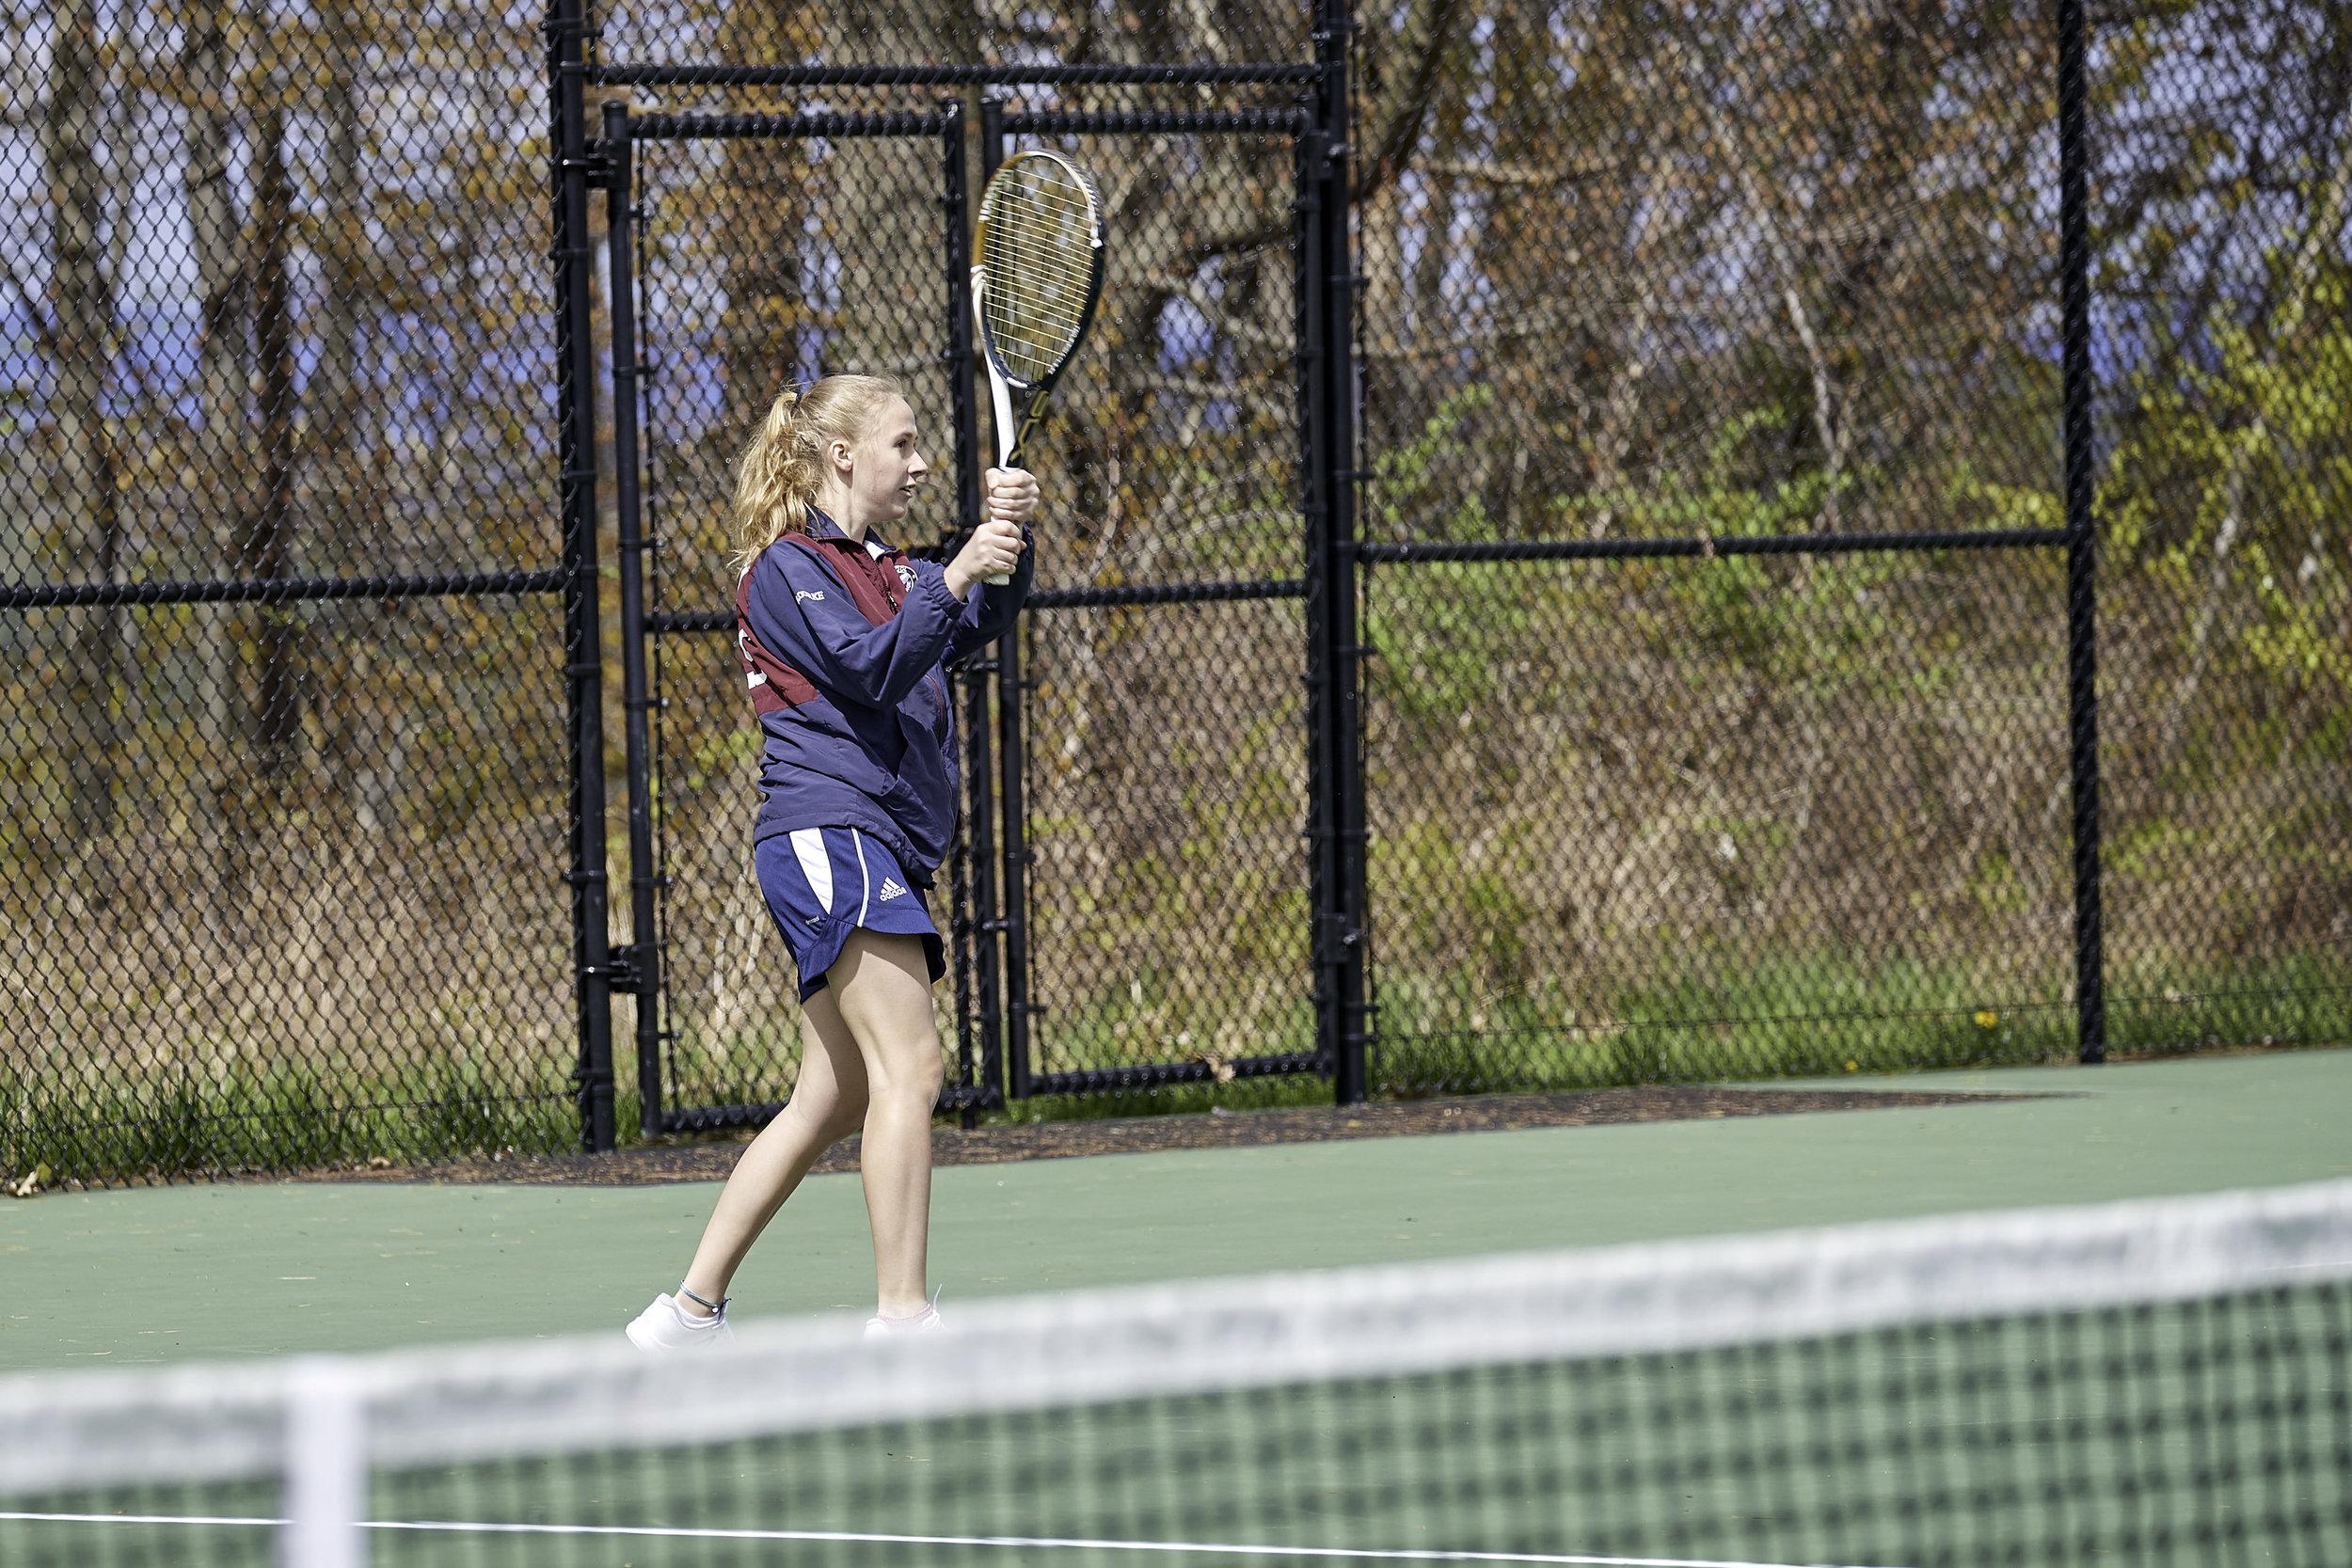 Girls Tennis vs. Winchendon School - May 15, 2019 -195161.jpg